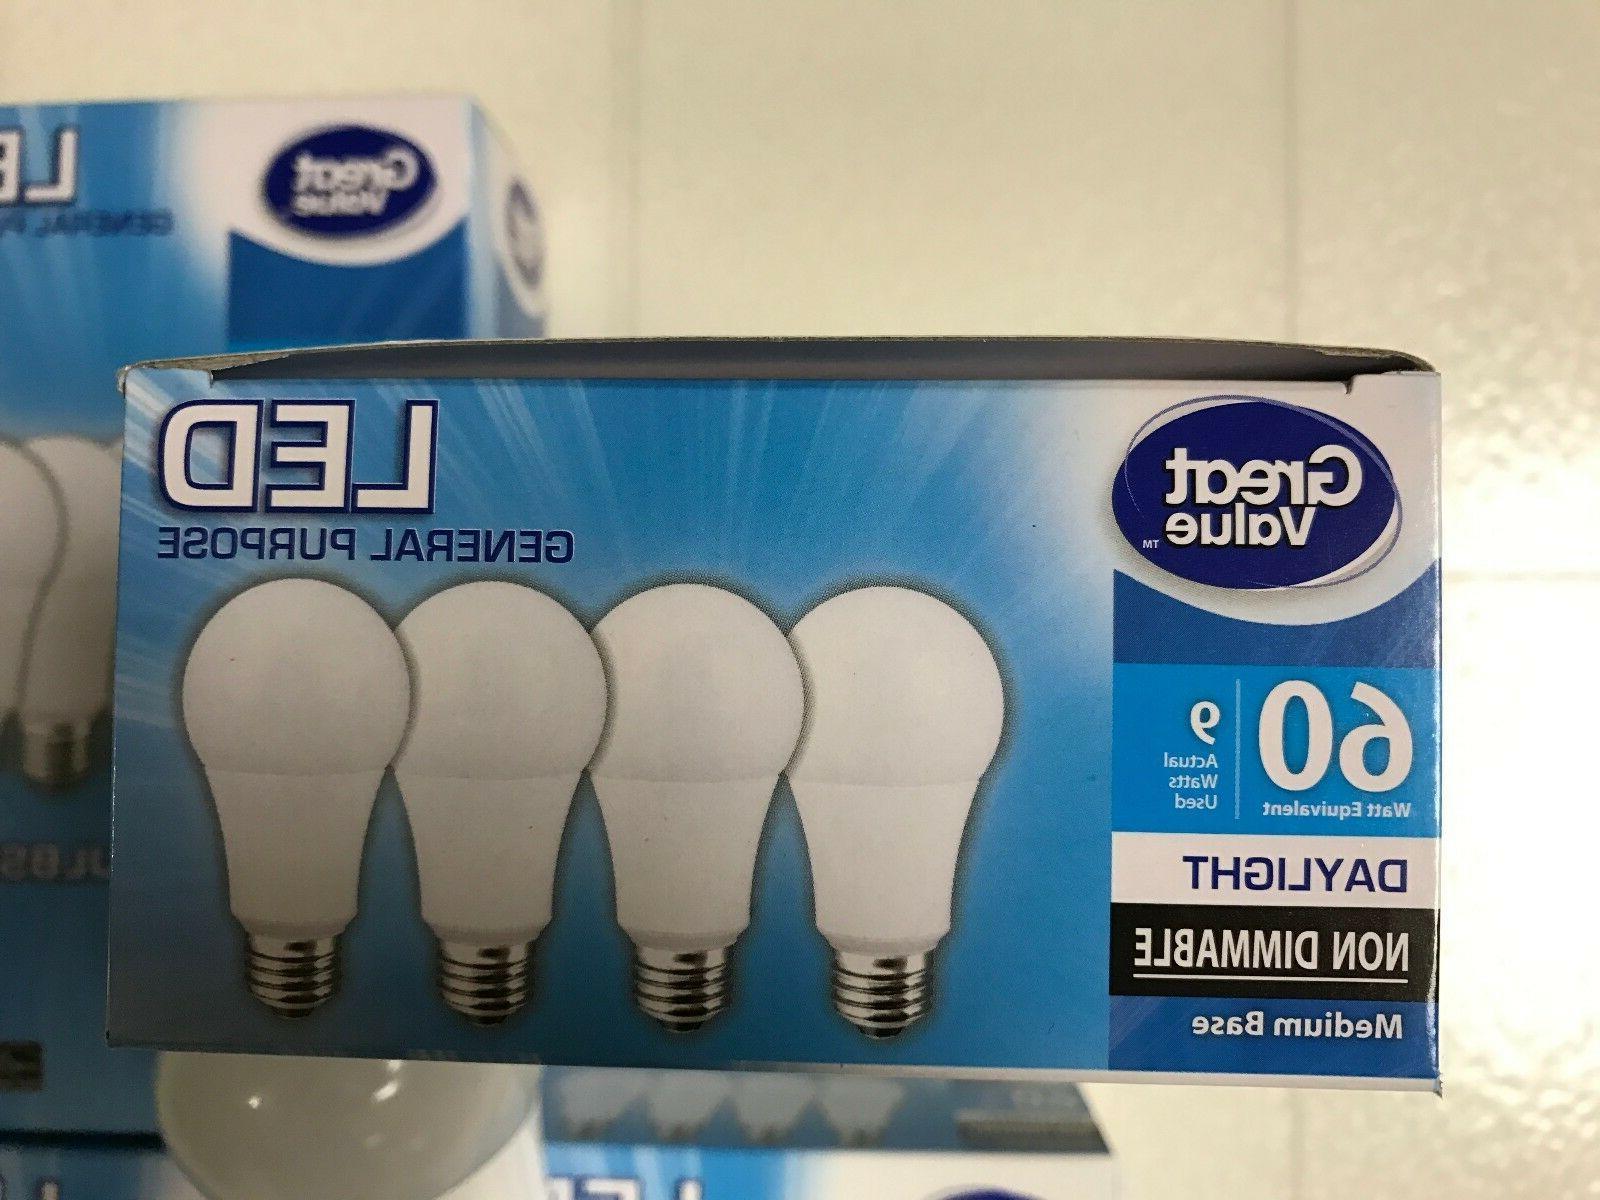 Sweet Pack LED 60W 60 A19 5000K light bulb